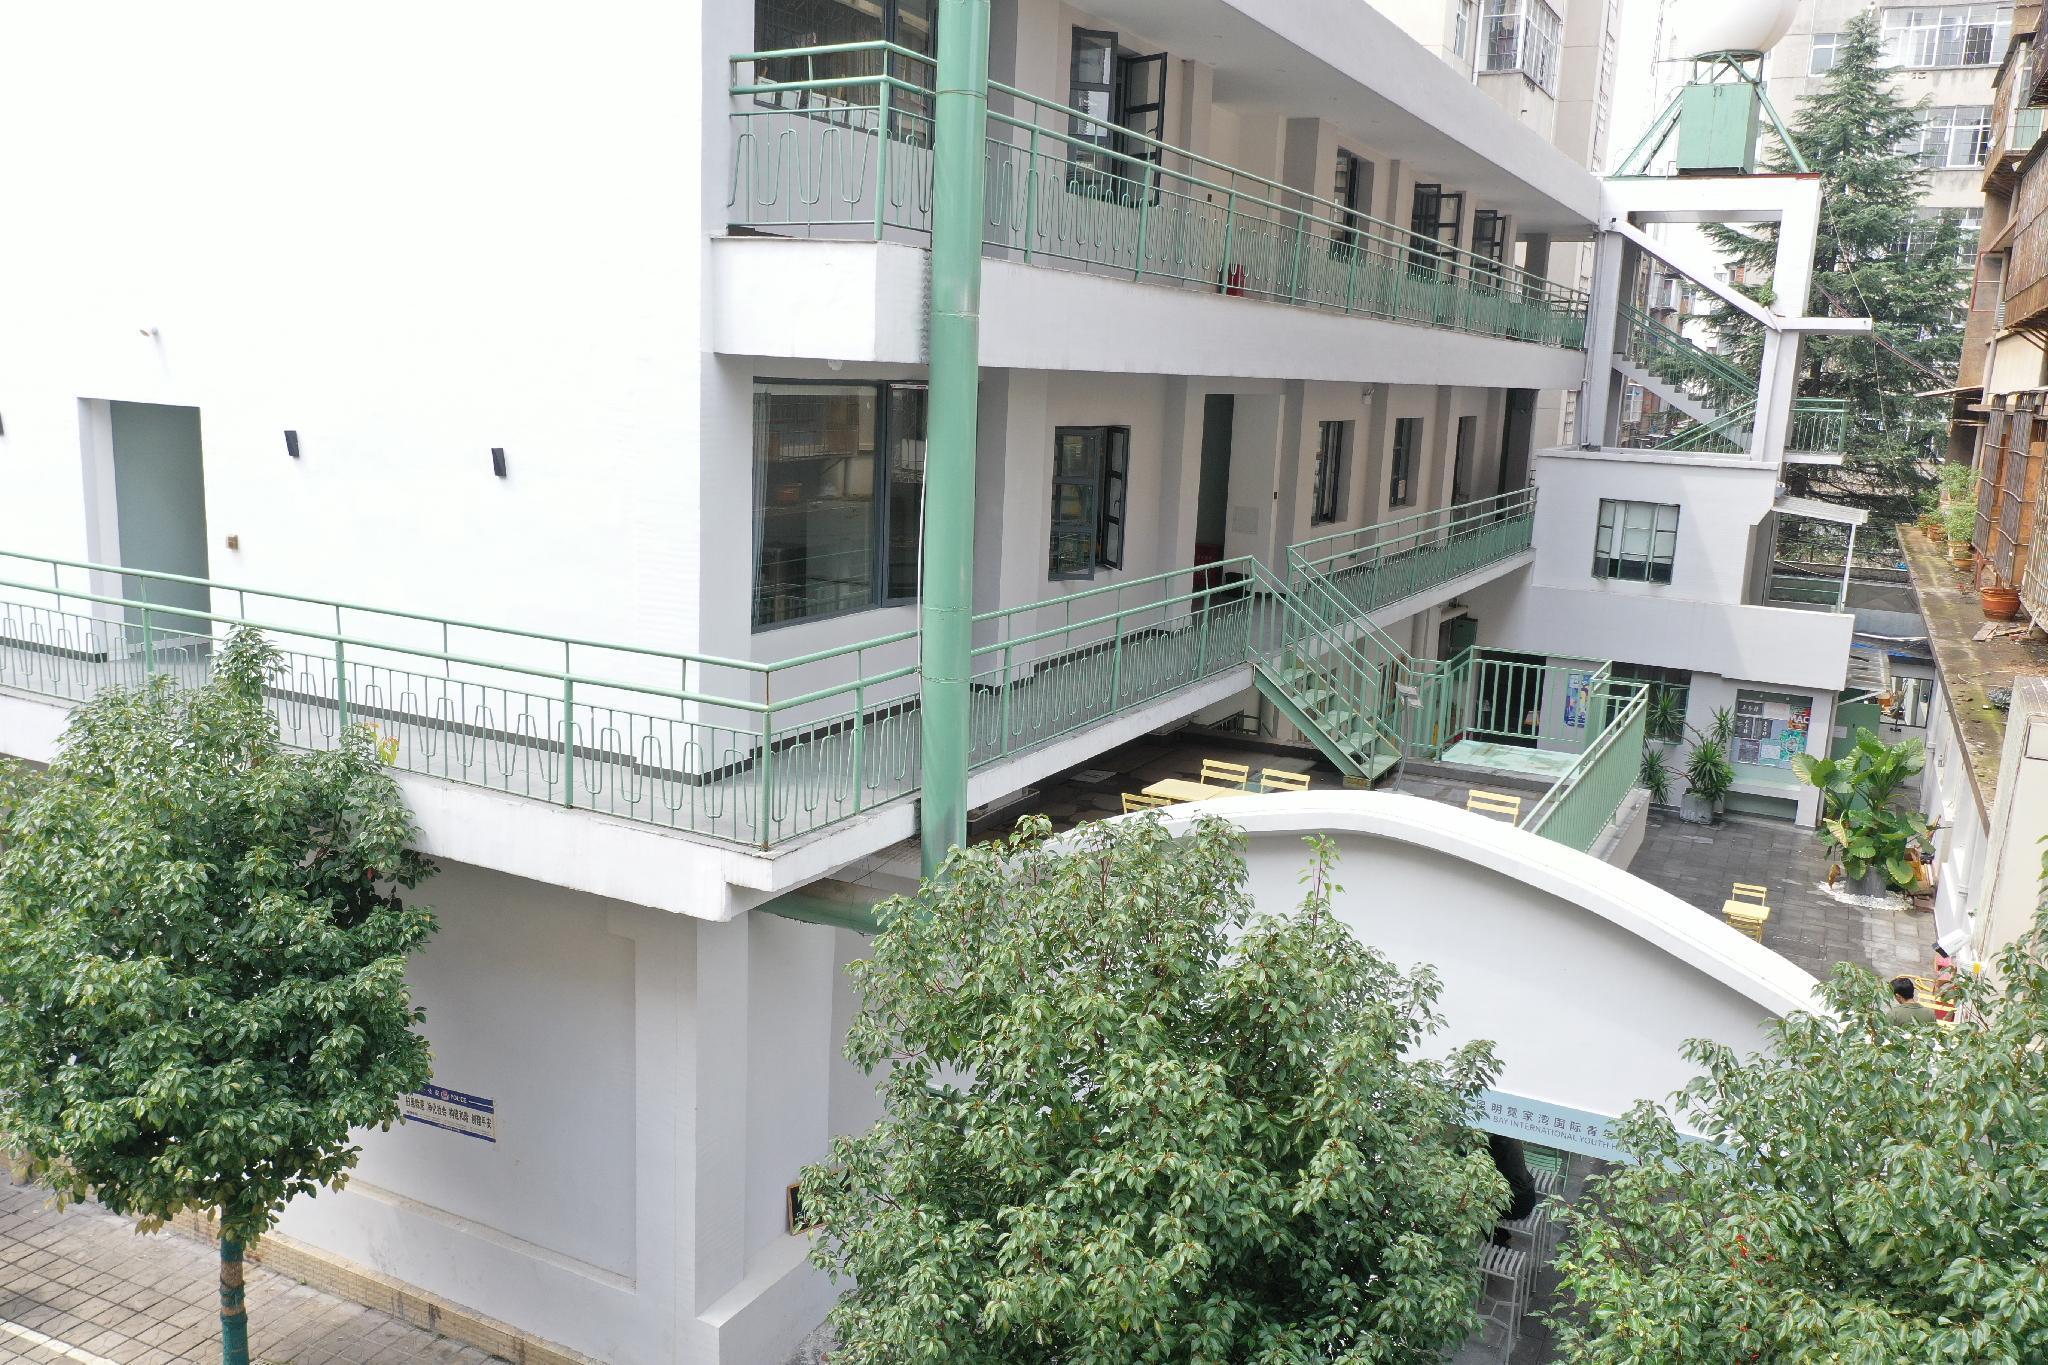 NEA BAY International Youth Hostel